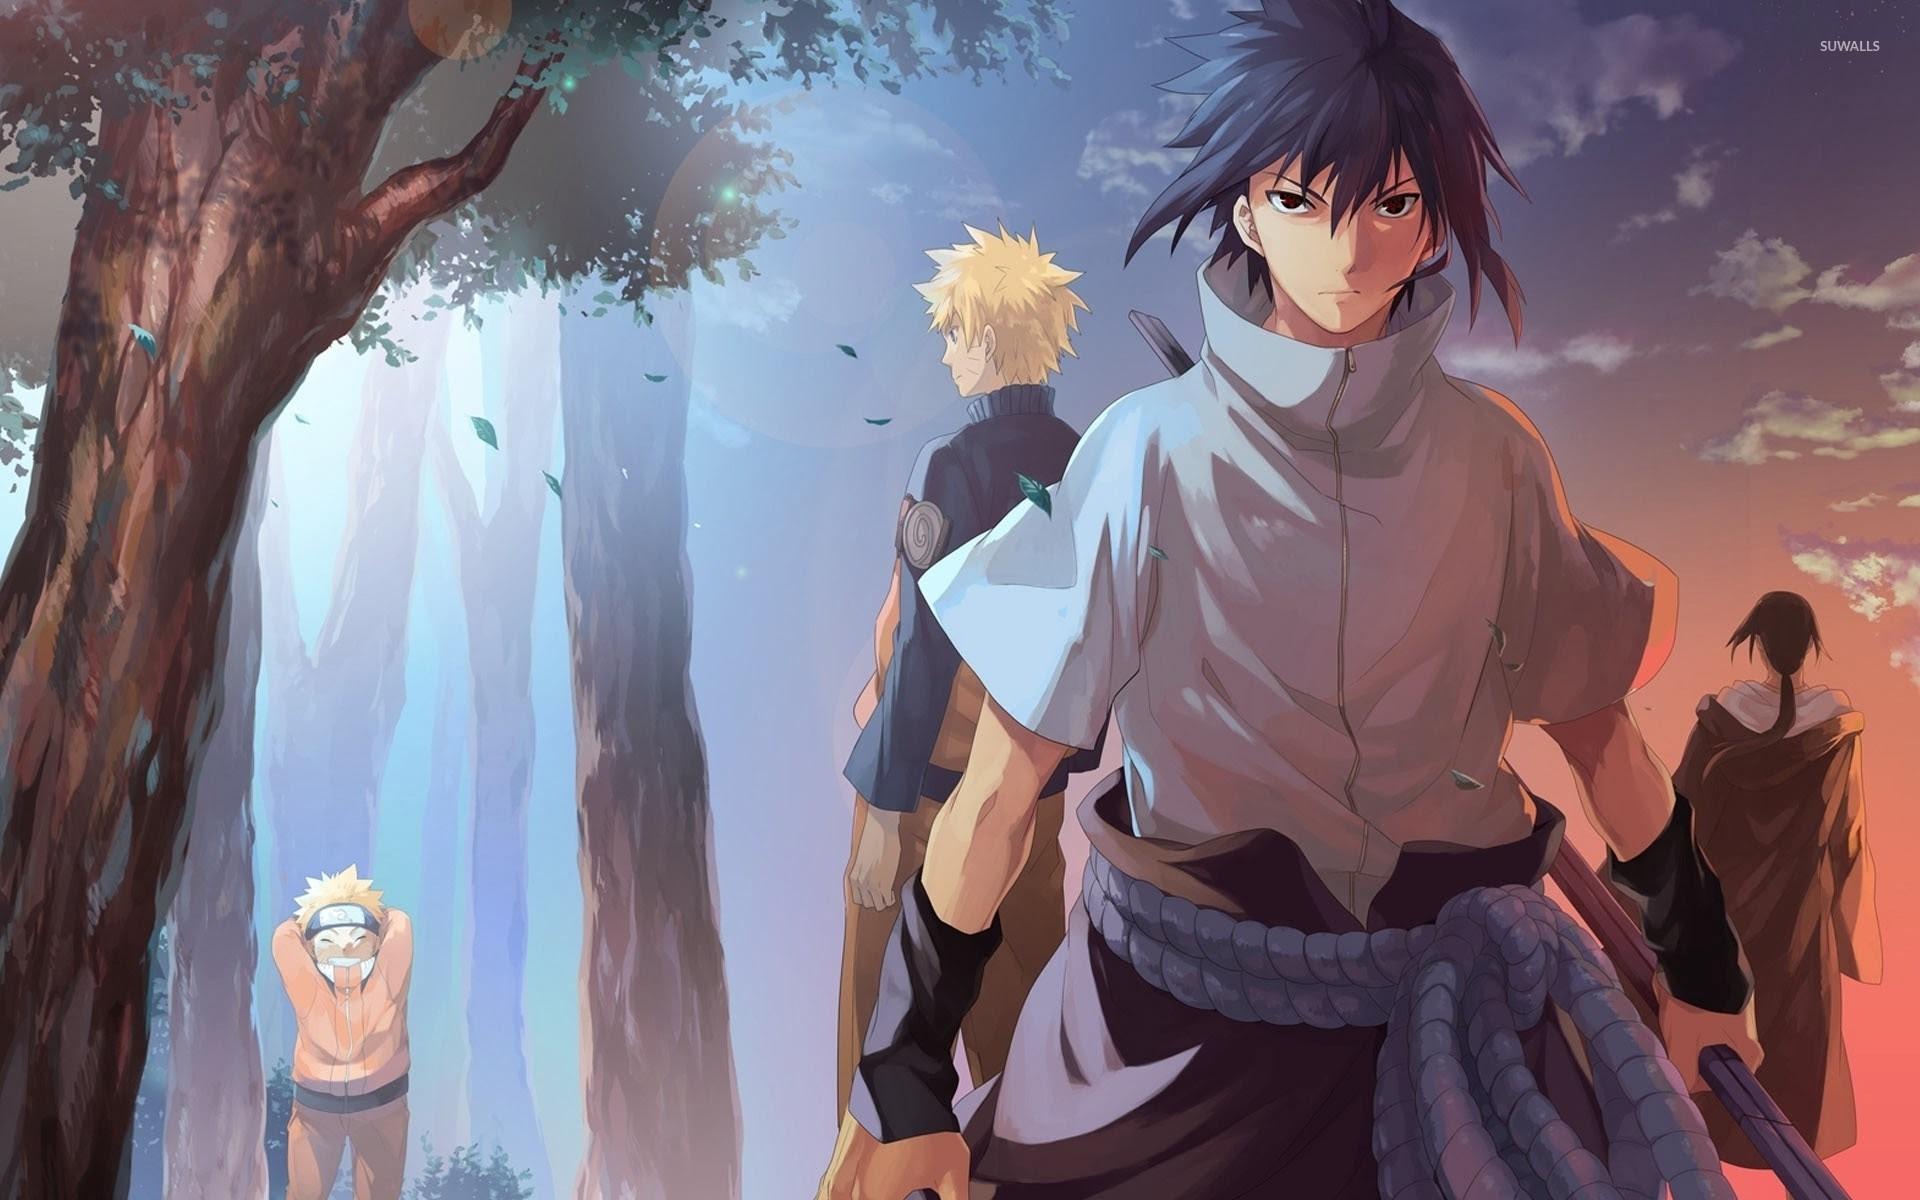 Cartoon Wallpaper Sasuke Vs Itachi Wallpaper: Naruto Vs Sasuke Wallpaper (57+ Images